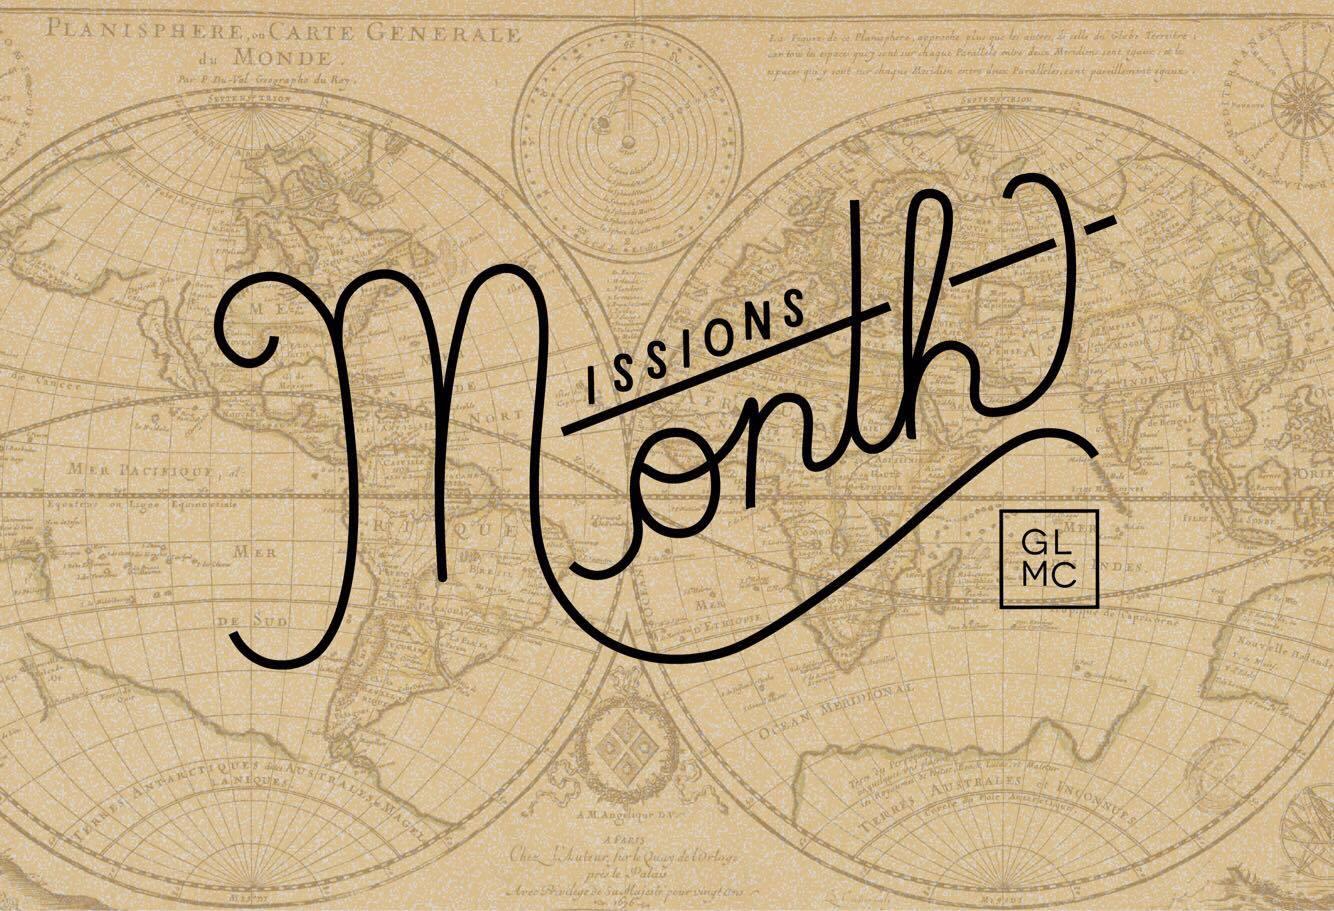 GLMC Missions Month 2017